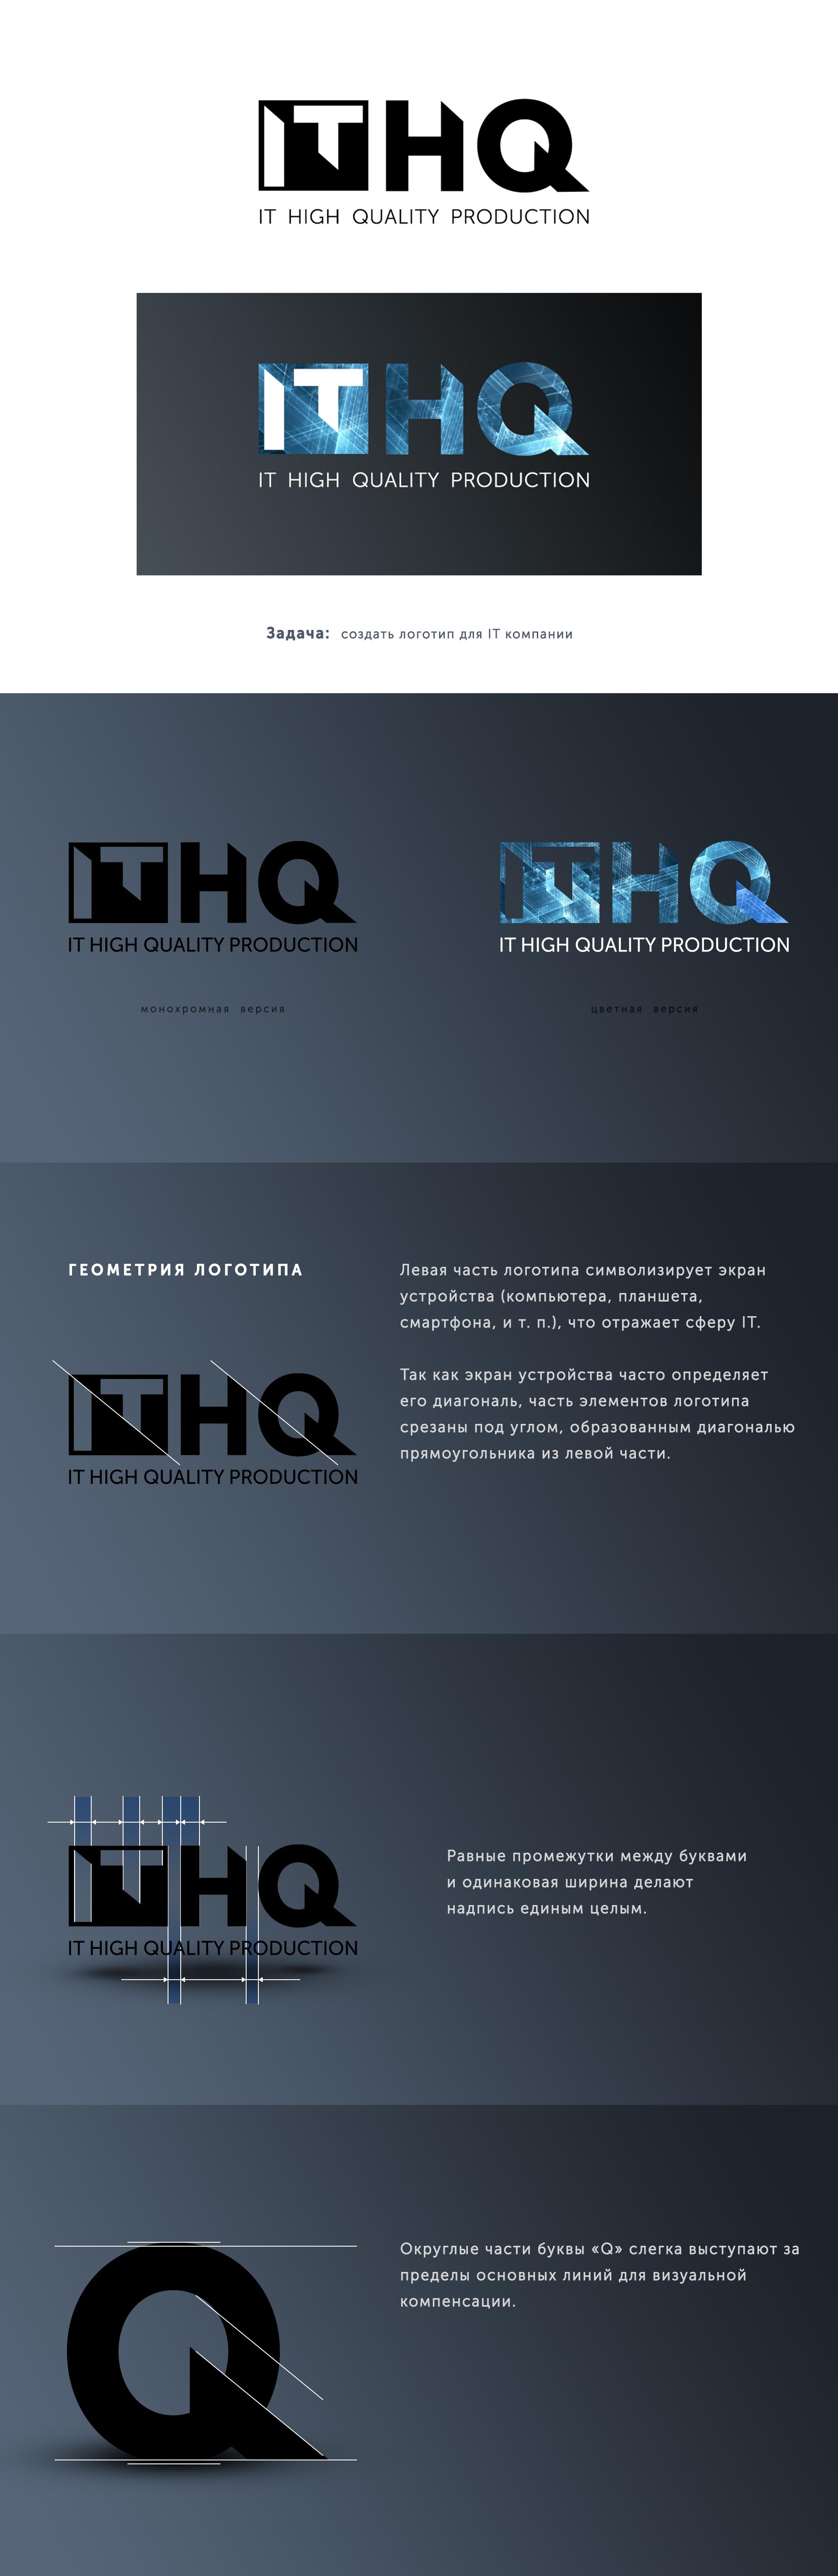 «ITHQ» – логотип для IT компании